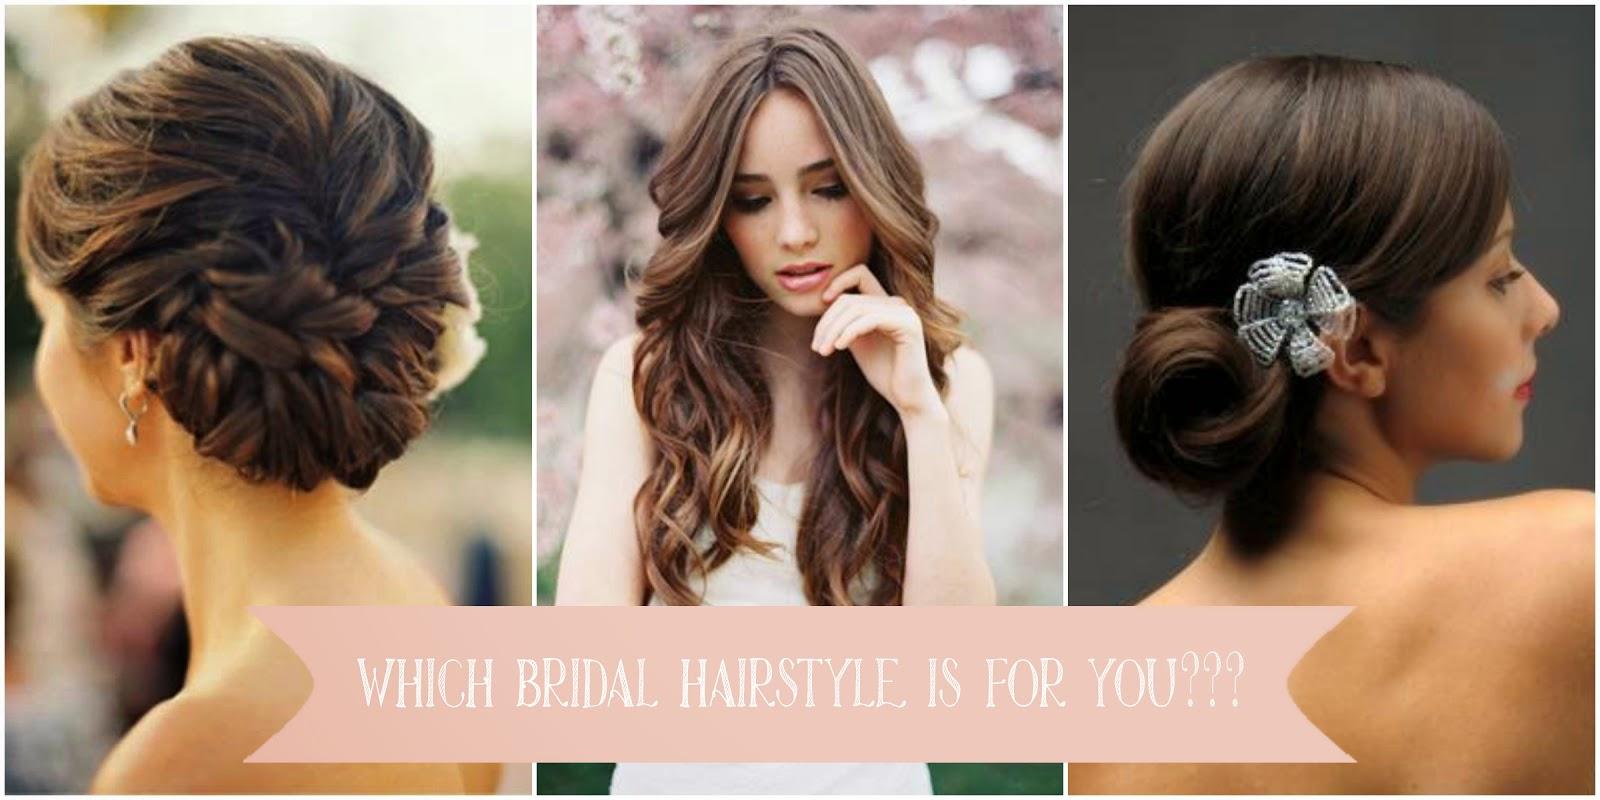 celebrity stylist hair tips